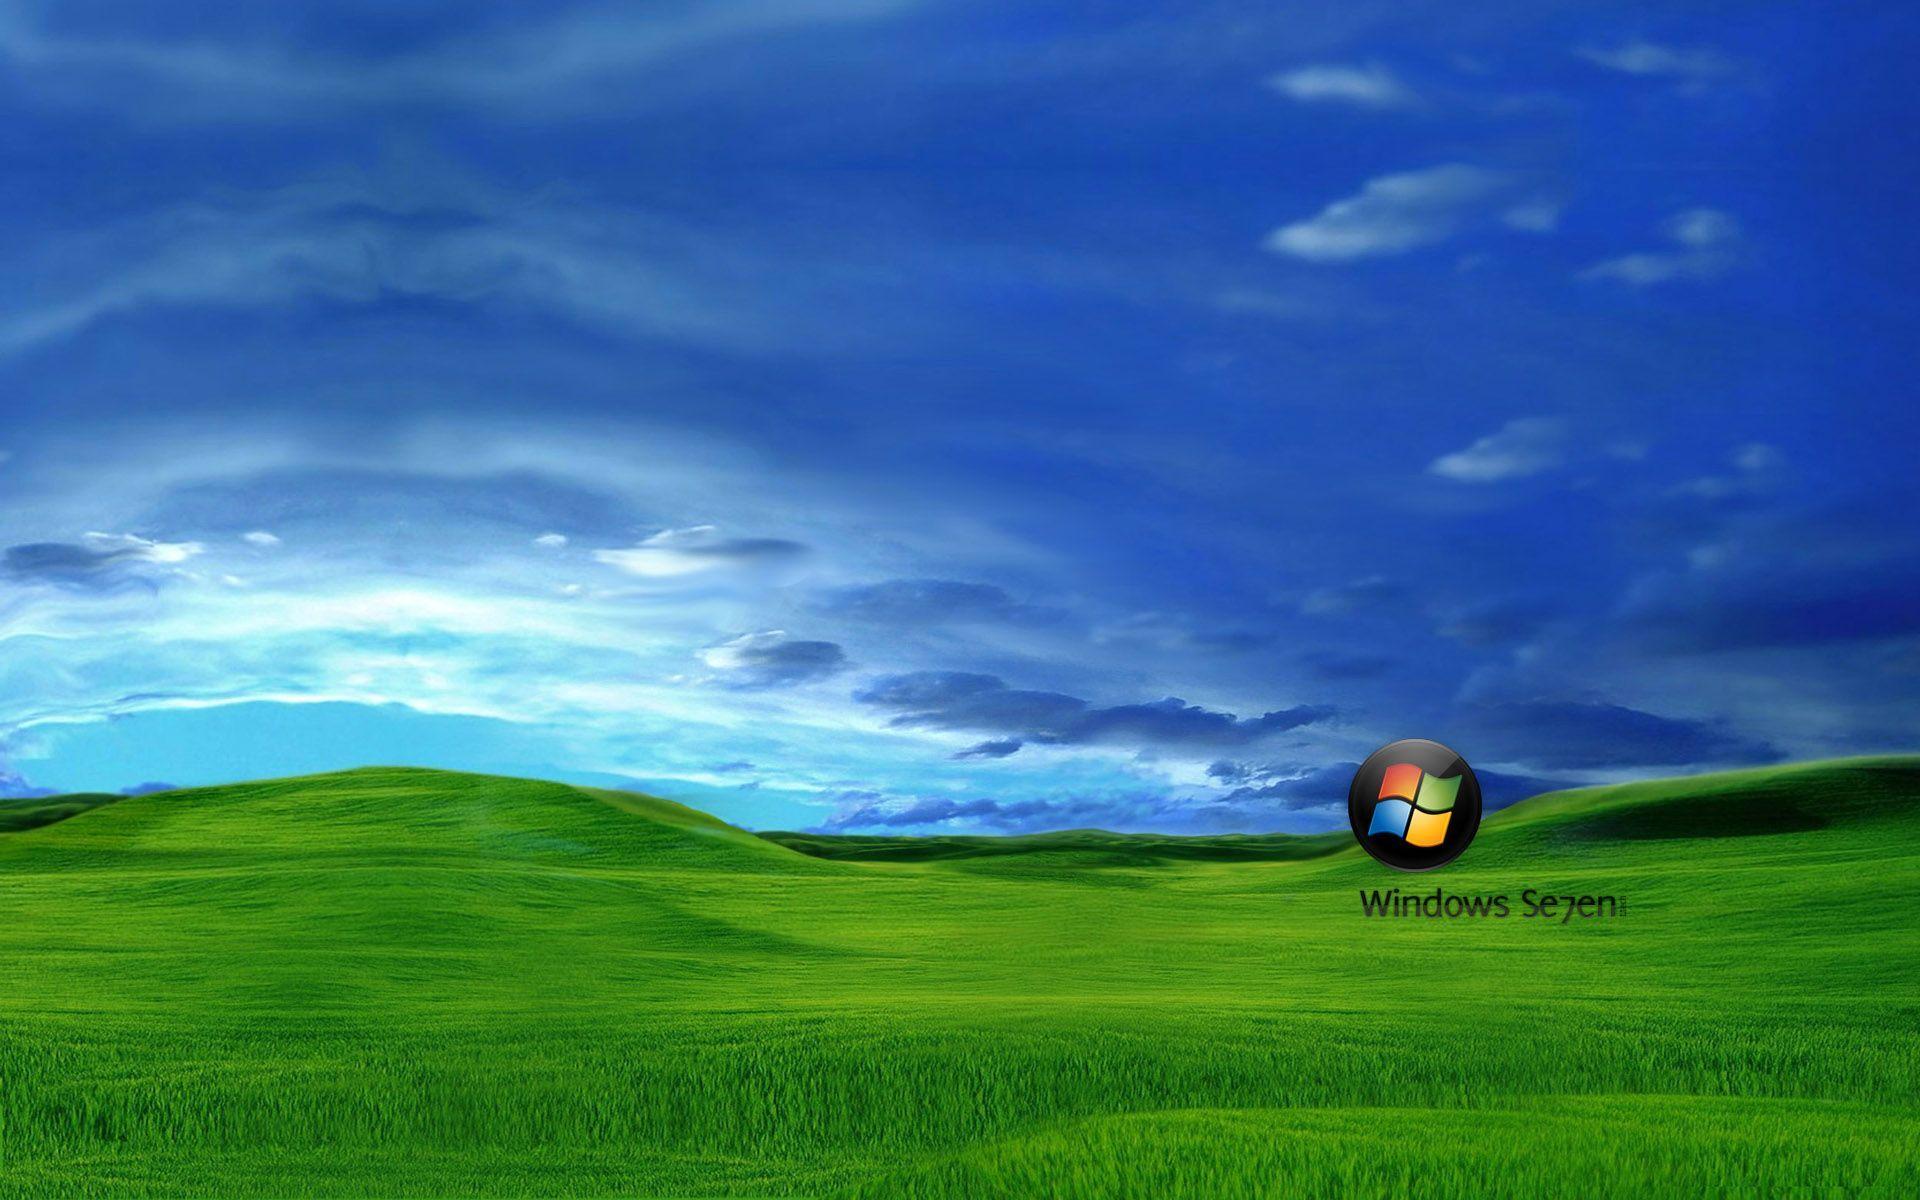 Windows XP Wallpaper Location Free wallpaper download 1920